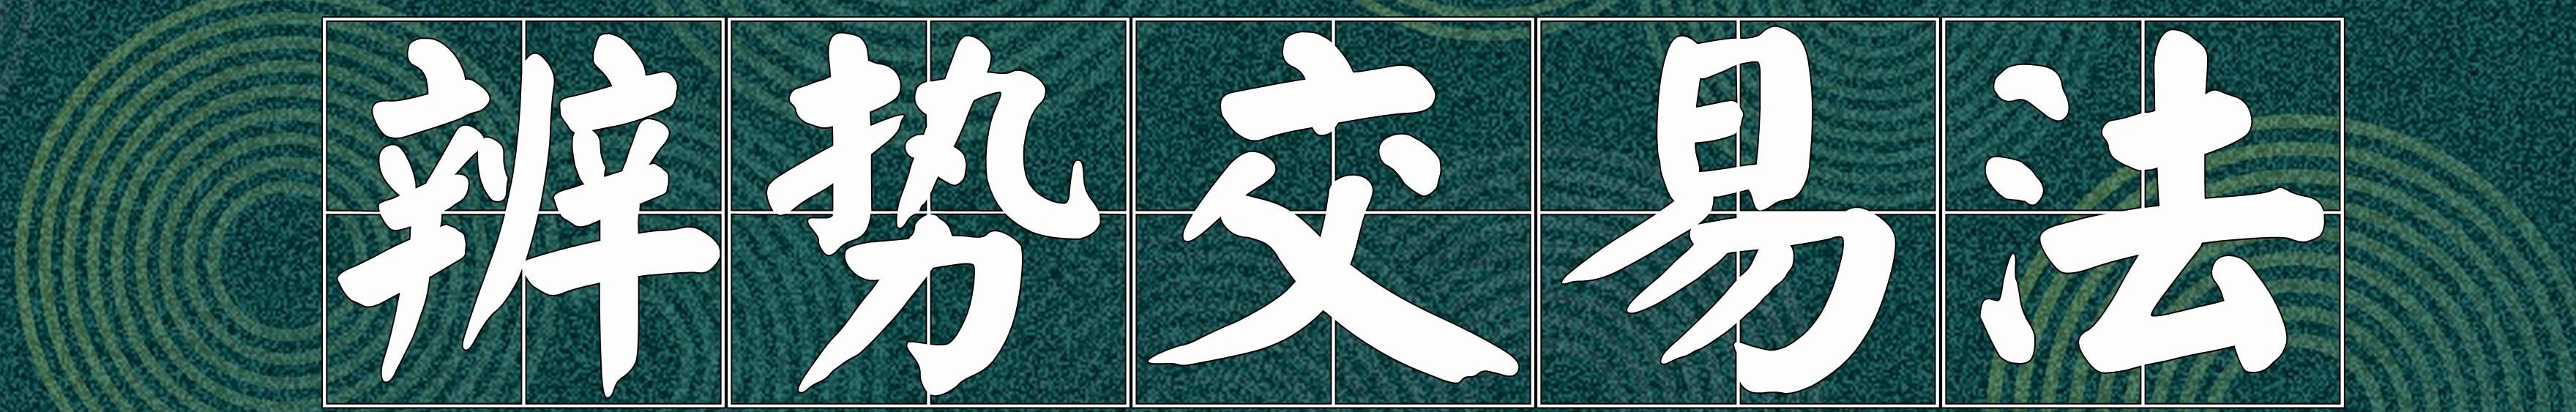 老邱学交易 banner